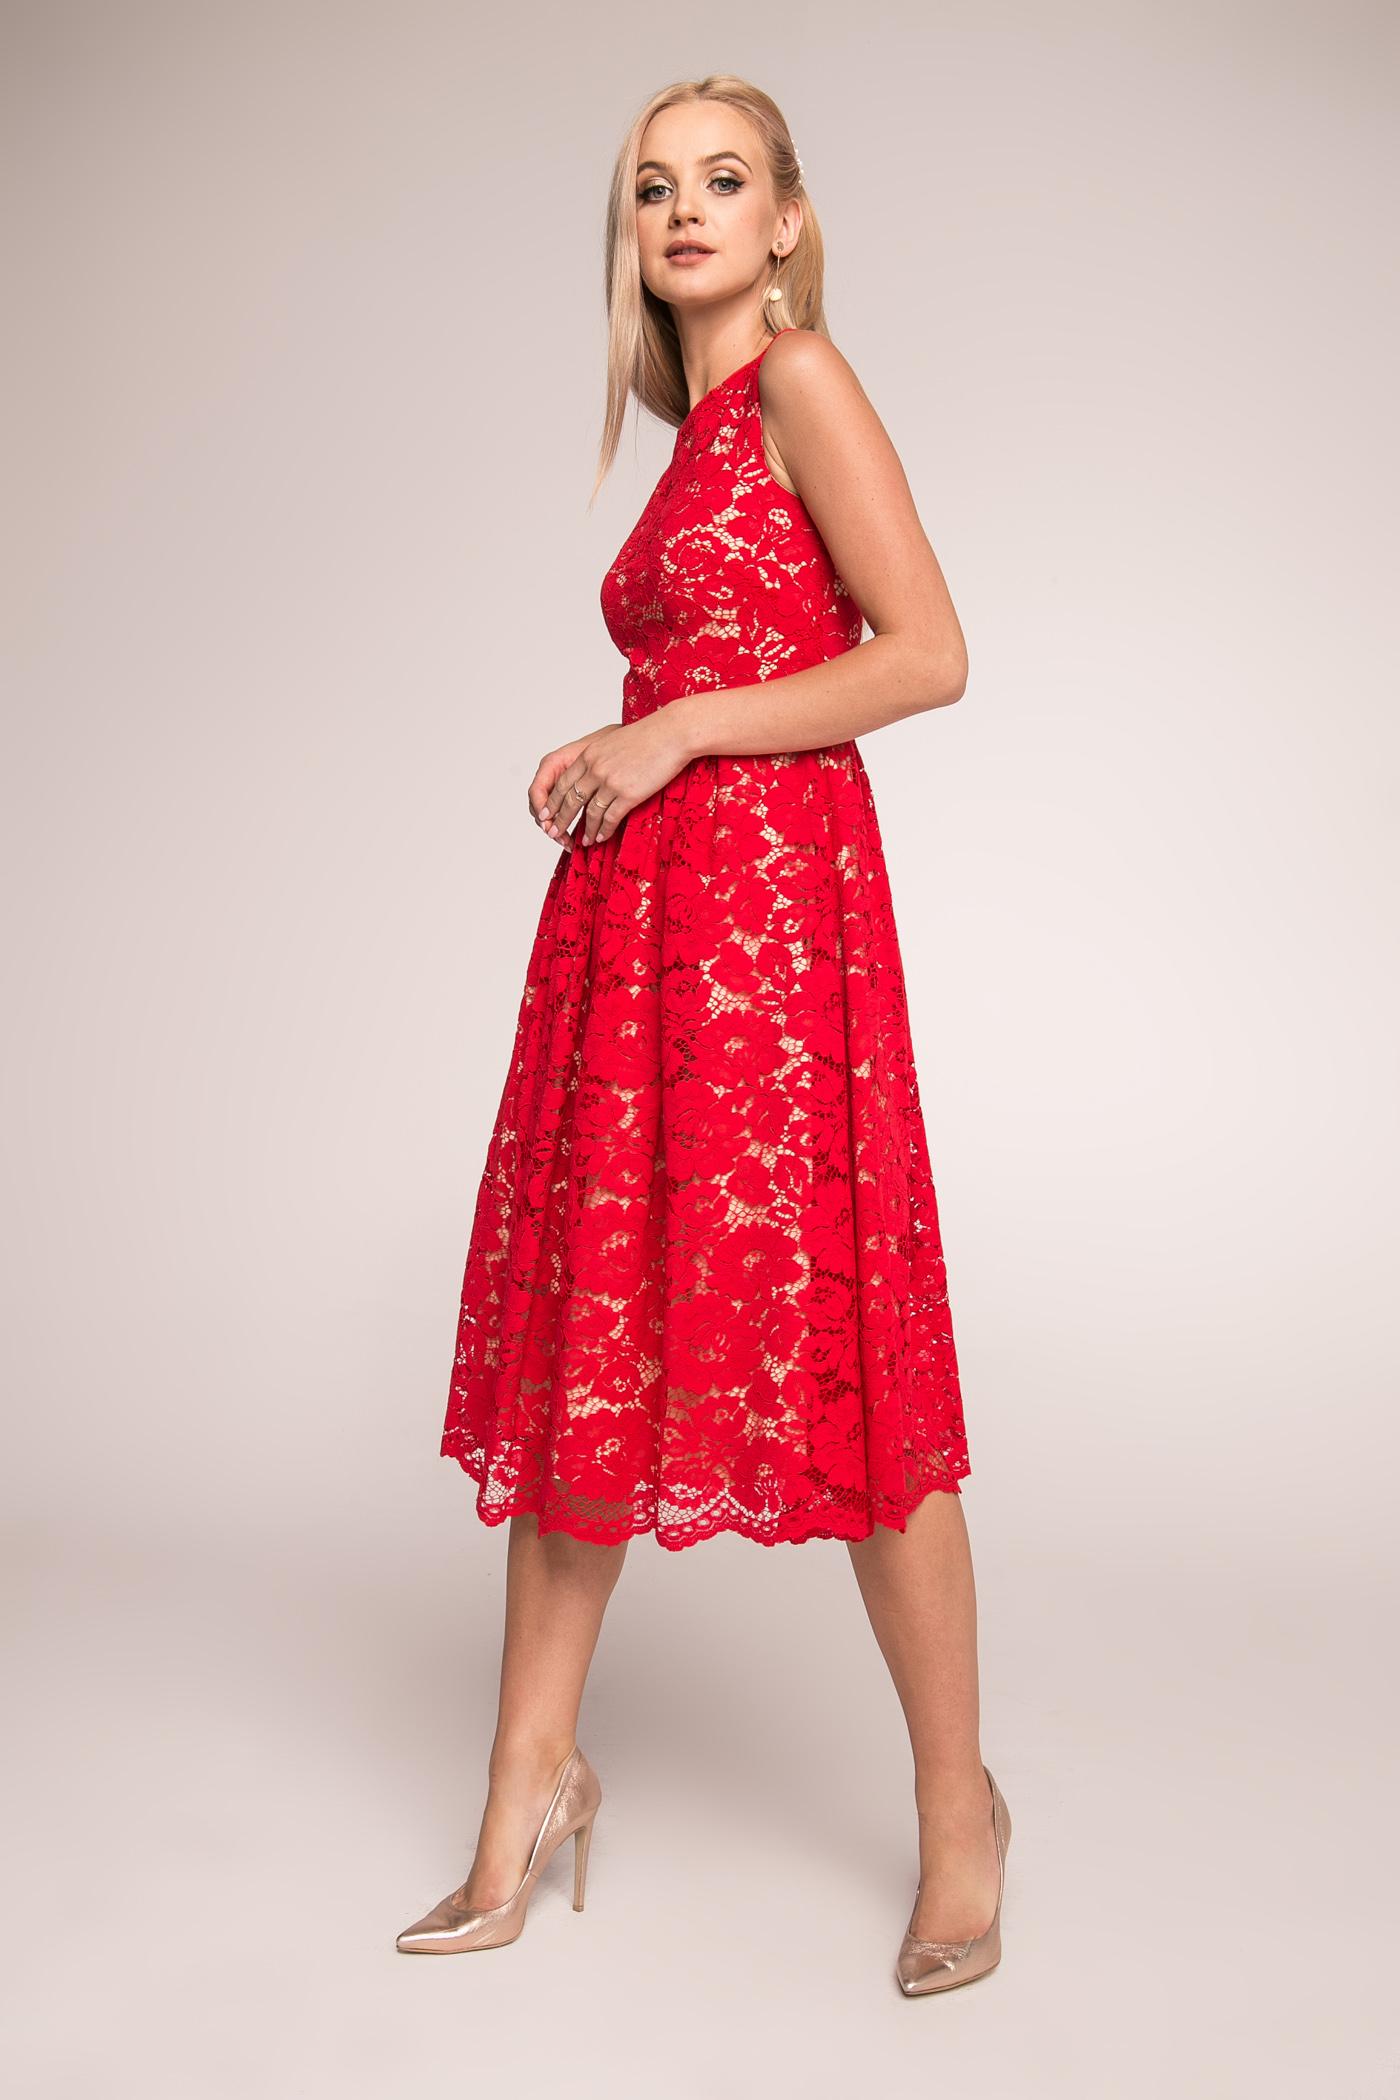 b451083d Czerwona koronkowa sukienka midi June by Swing